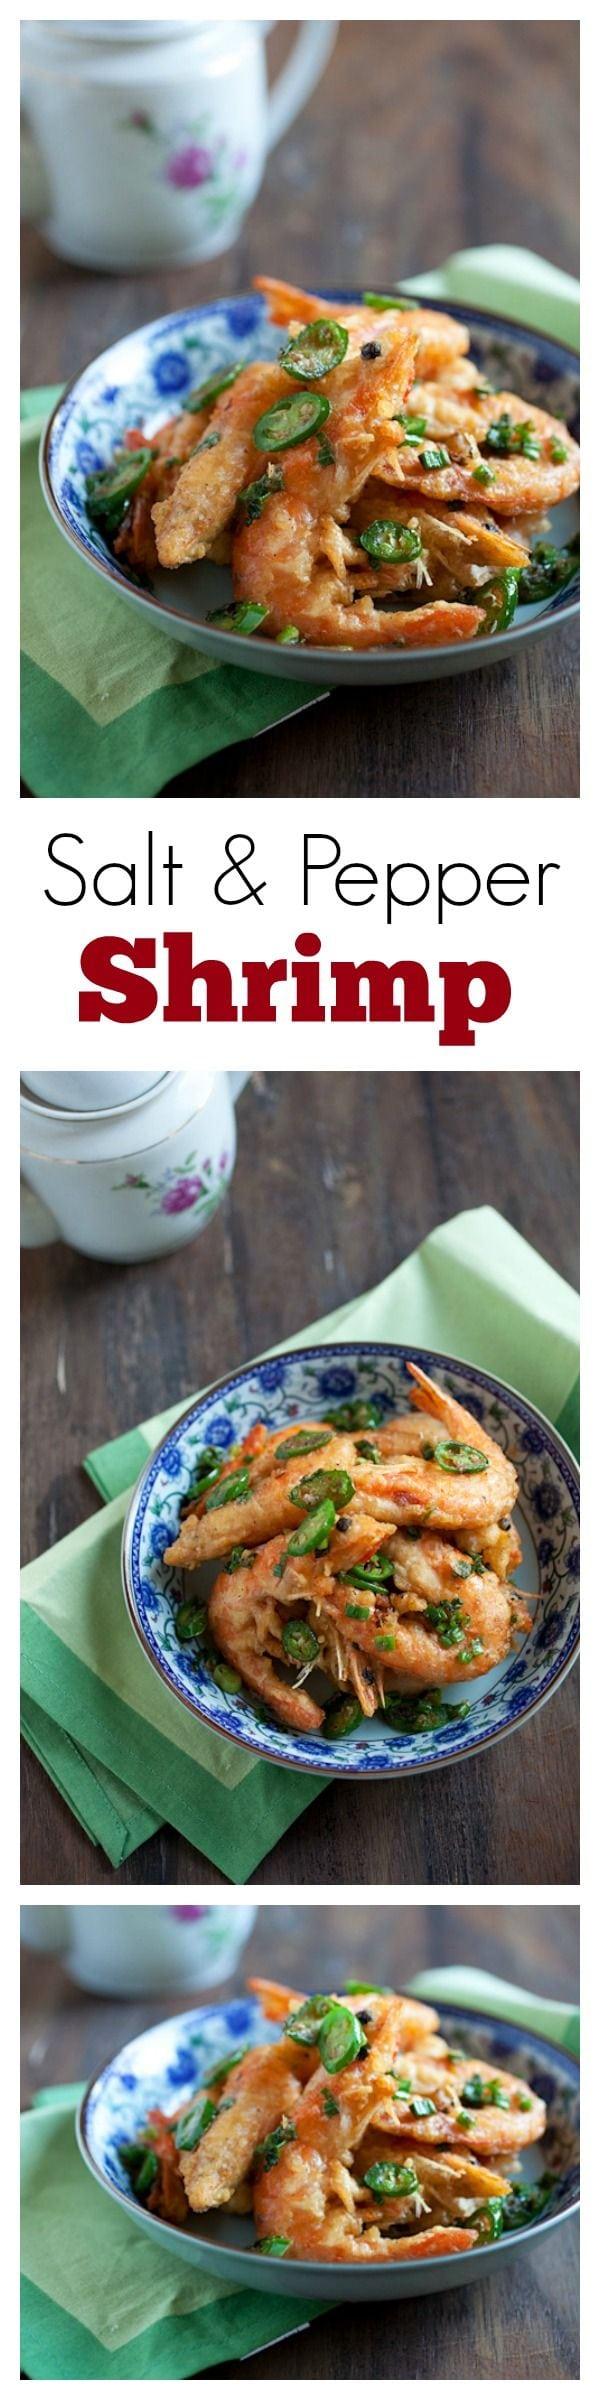 Salt & Pepper Shrimp - Chinese restaurant-style salt & pepper shrimp recipe. SO easy, yummy & budget friendly!! | rasamalaysia.com